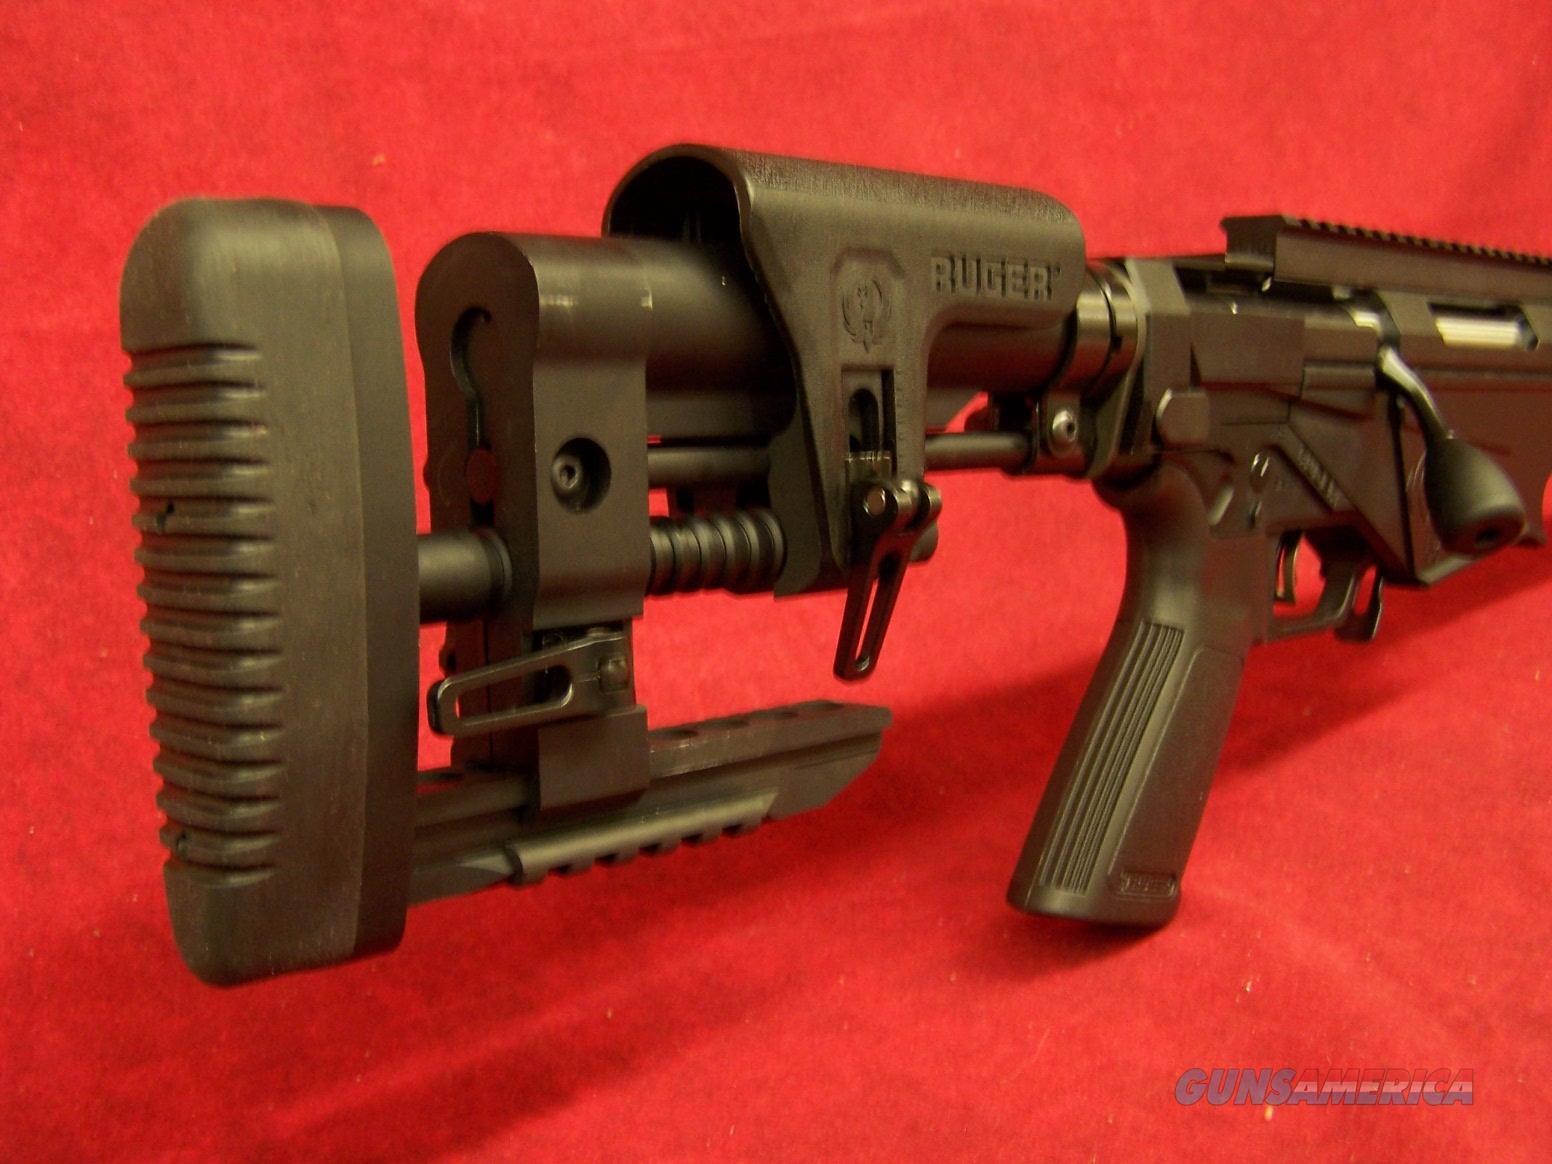 Ruger Precision Rifle 6.5 Creedmoor 24 Inch Steel Threaded Barrel 5R Rifling Hybrid Muzzle Brake (18008)  Guns > Rifles > Ruger Rifles > Precision Rifle Series